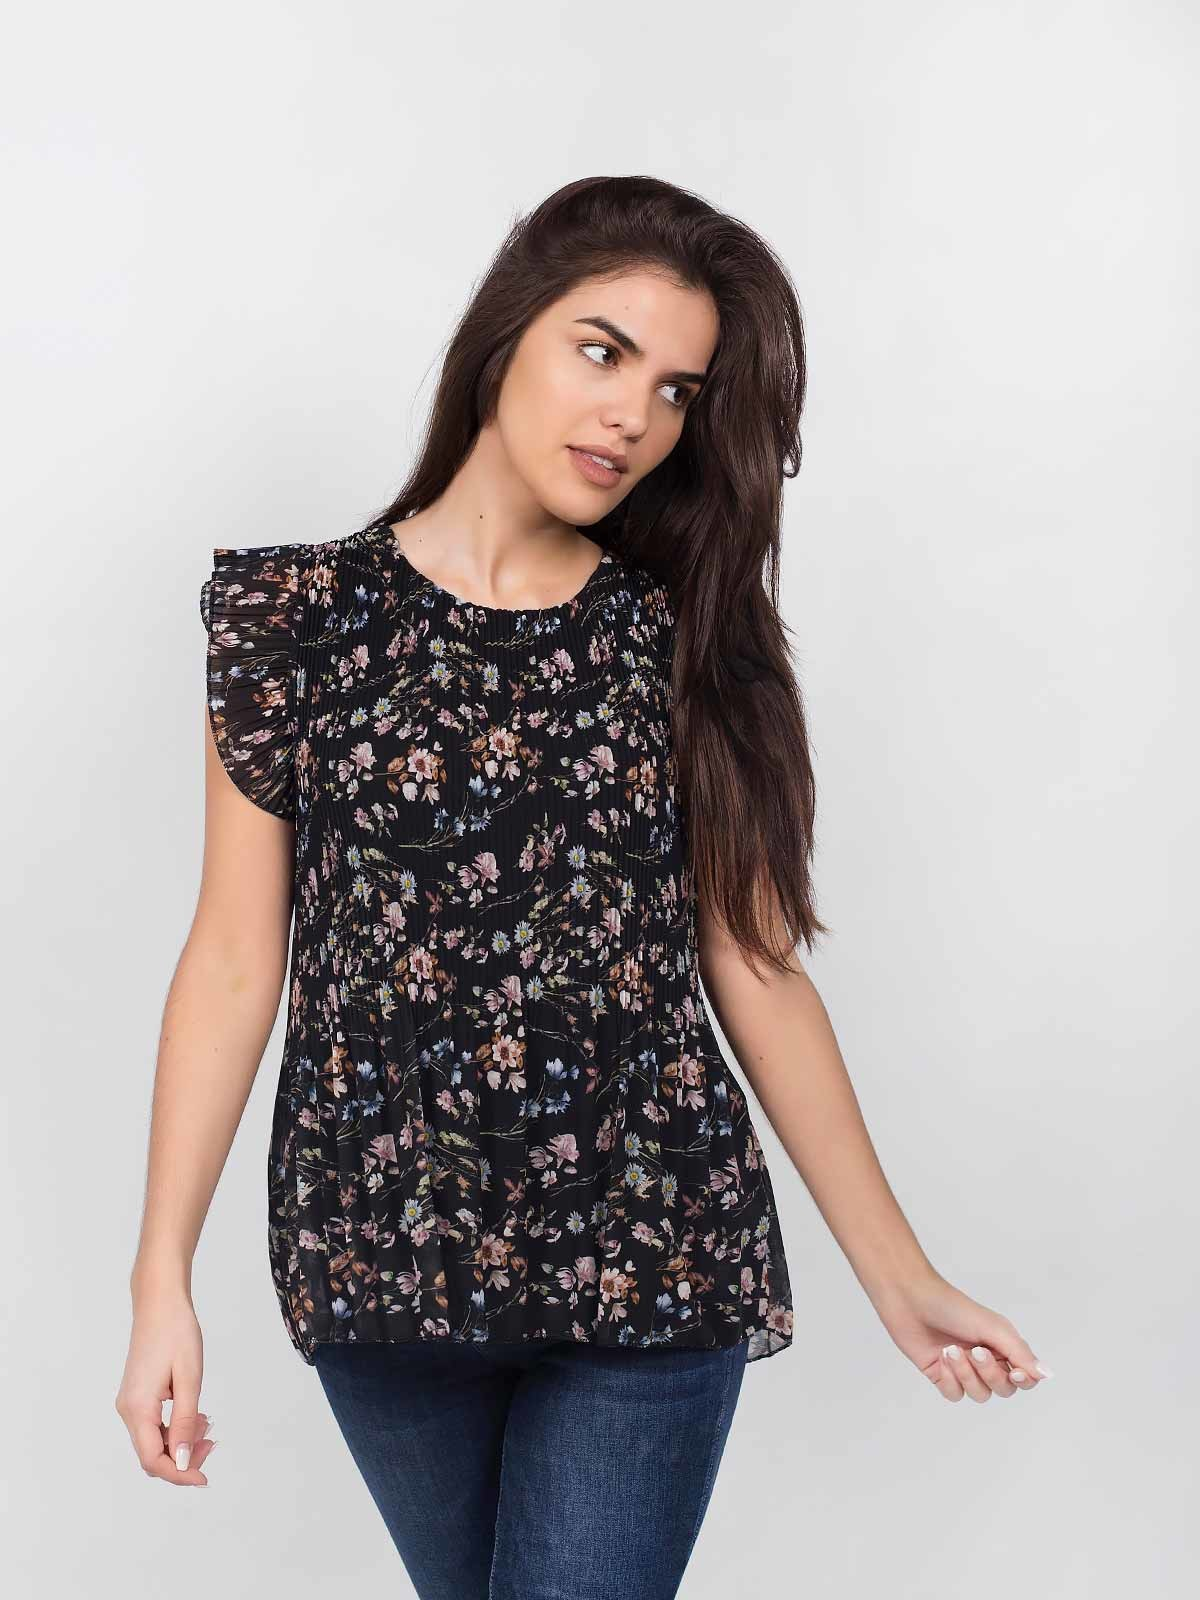 Blusa plissada estampado floral